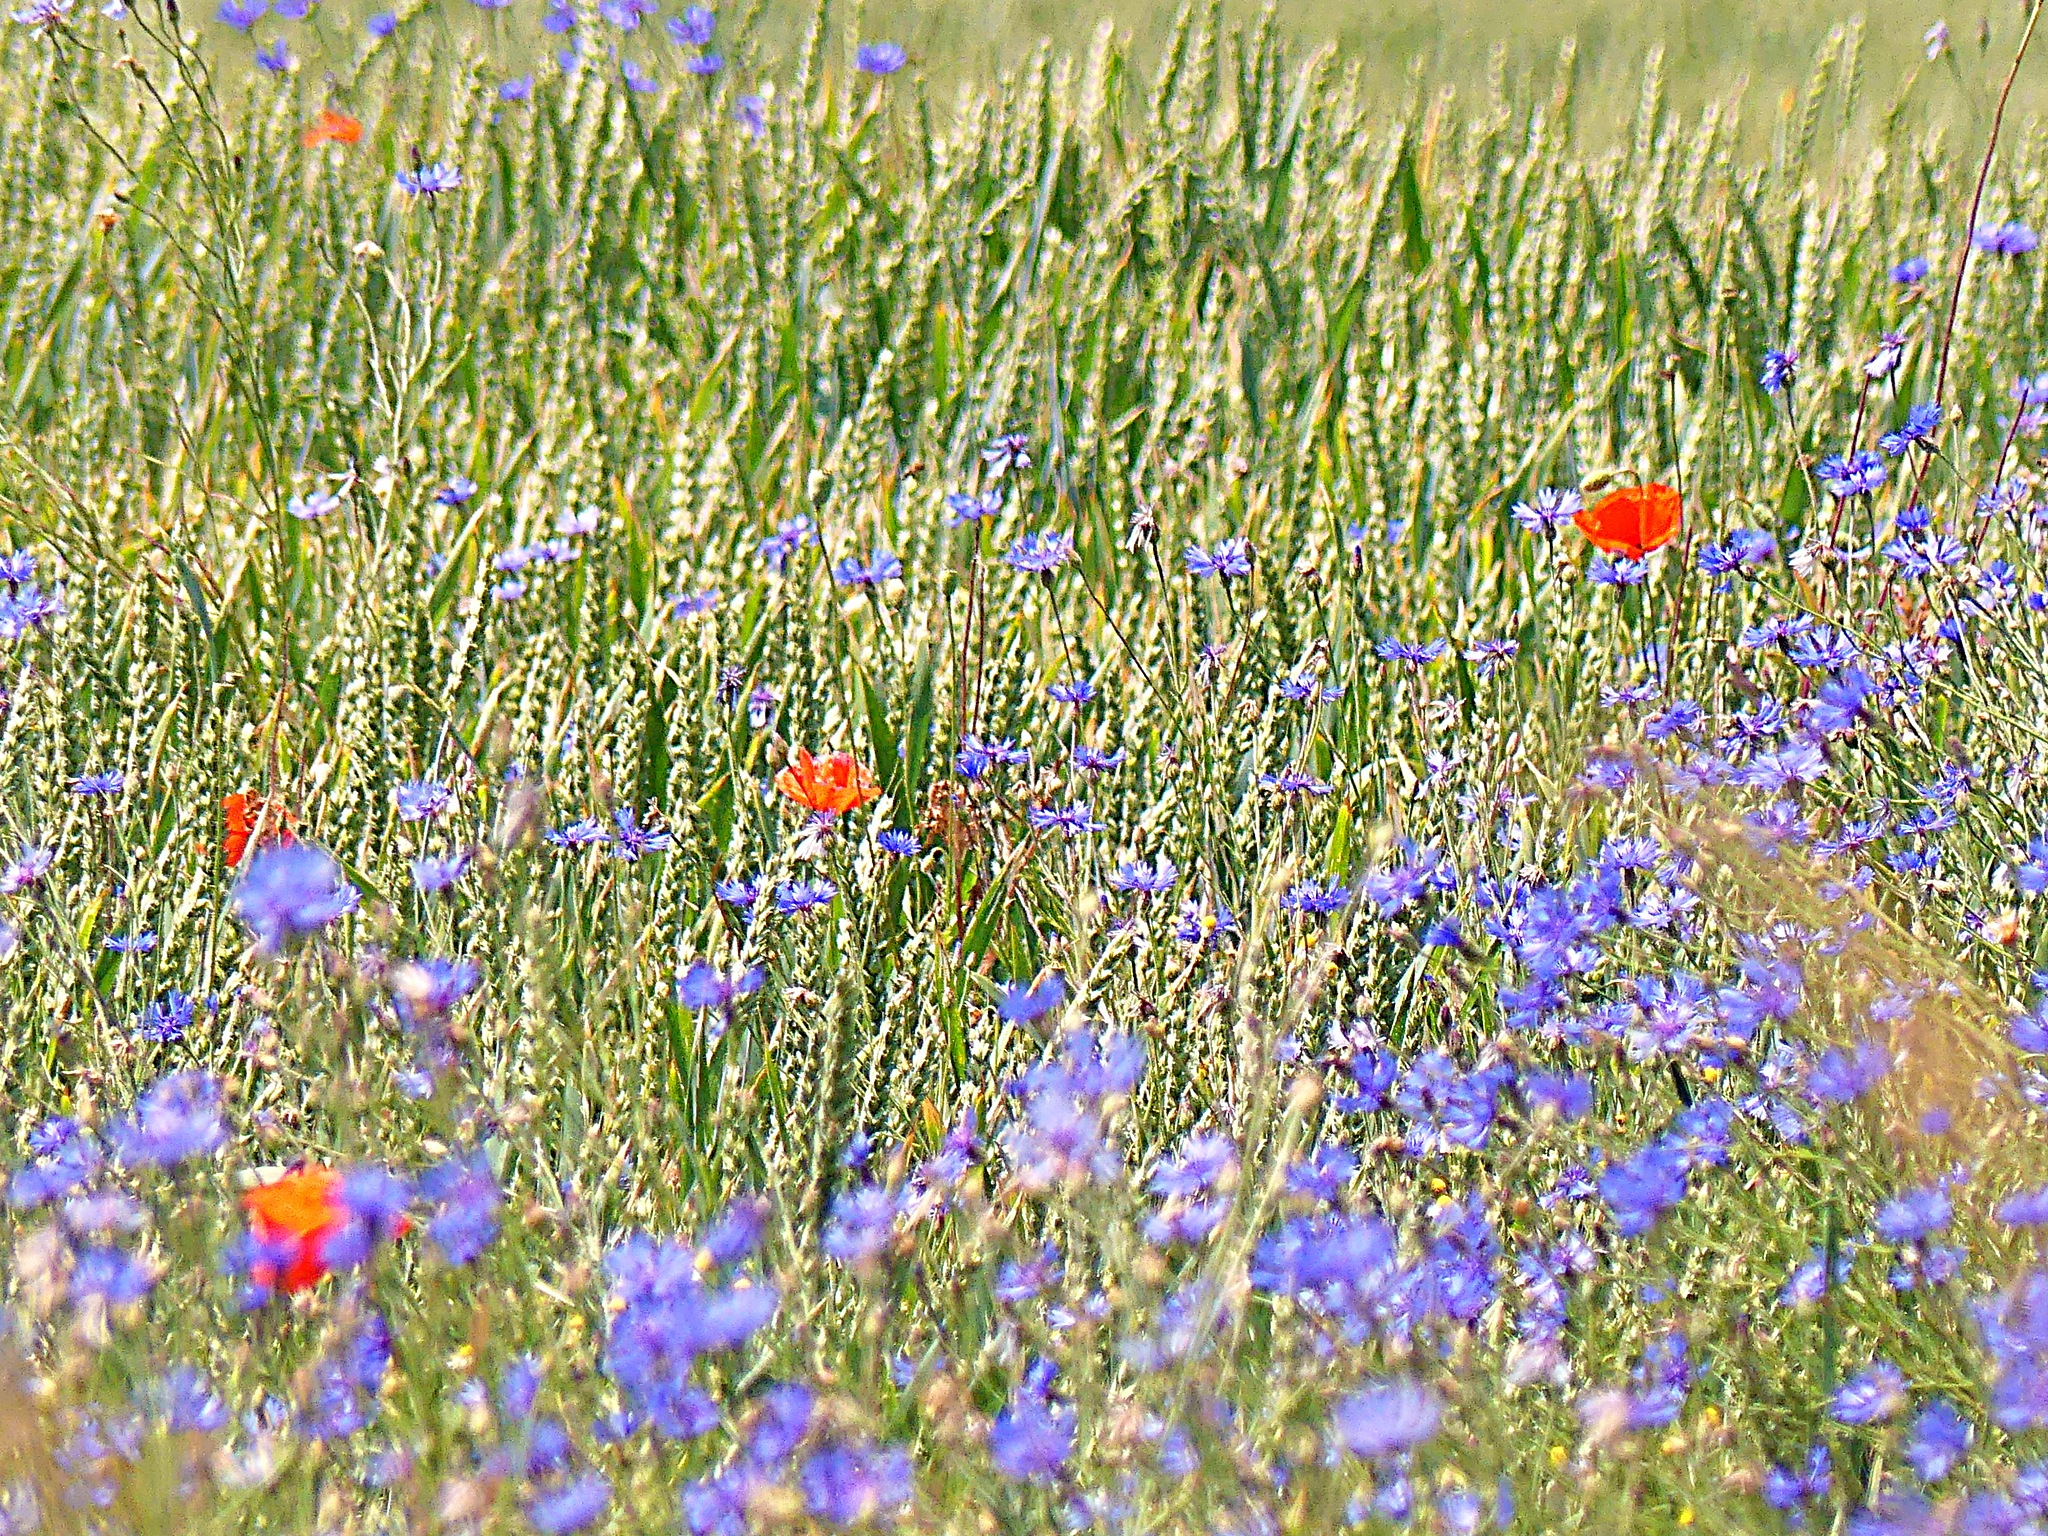 Cornflowers and poppies by Michal Vrtílek